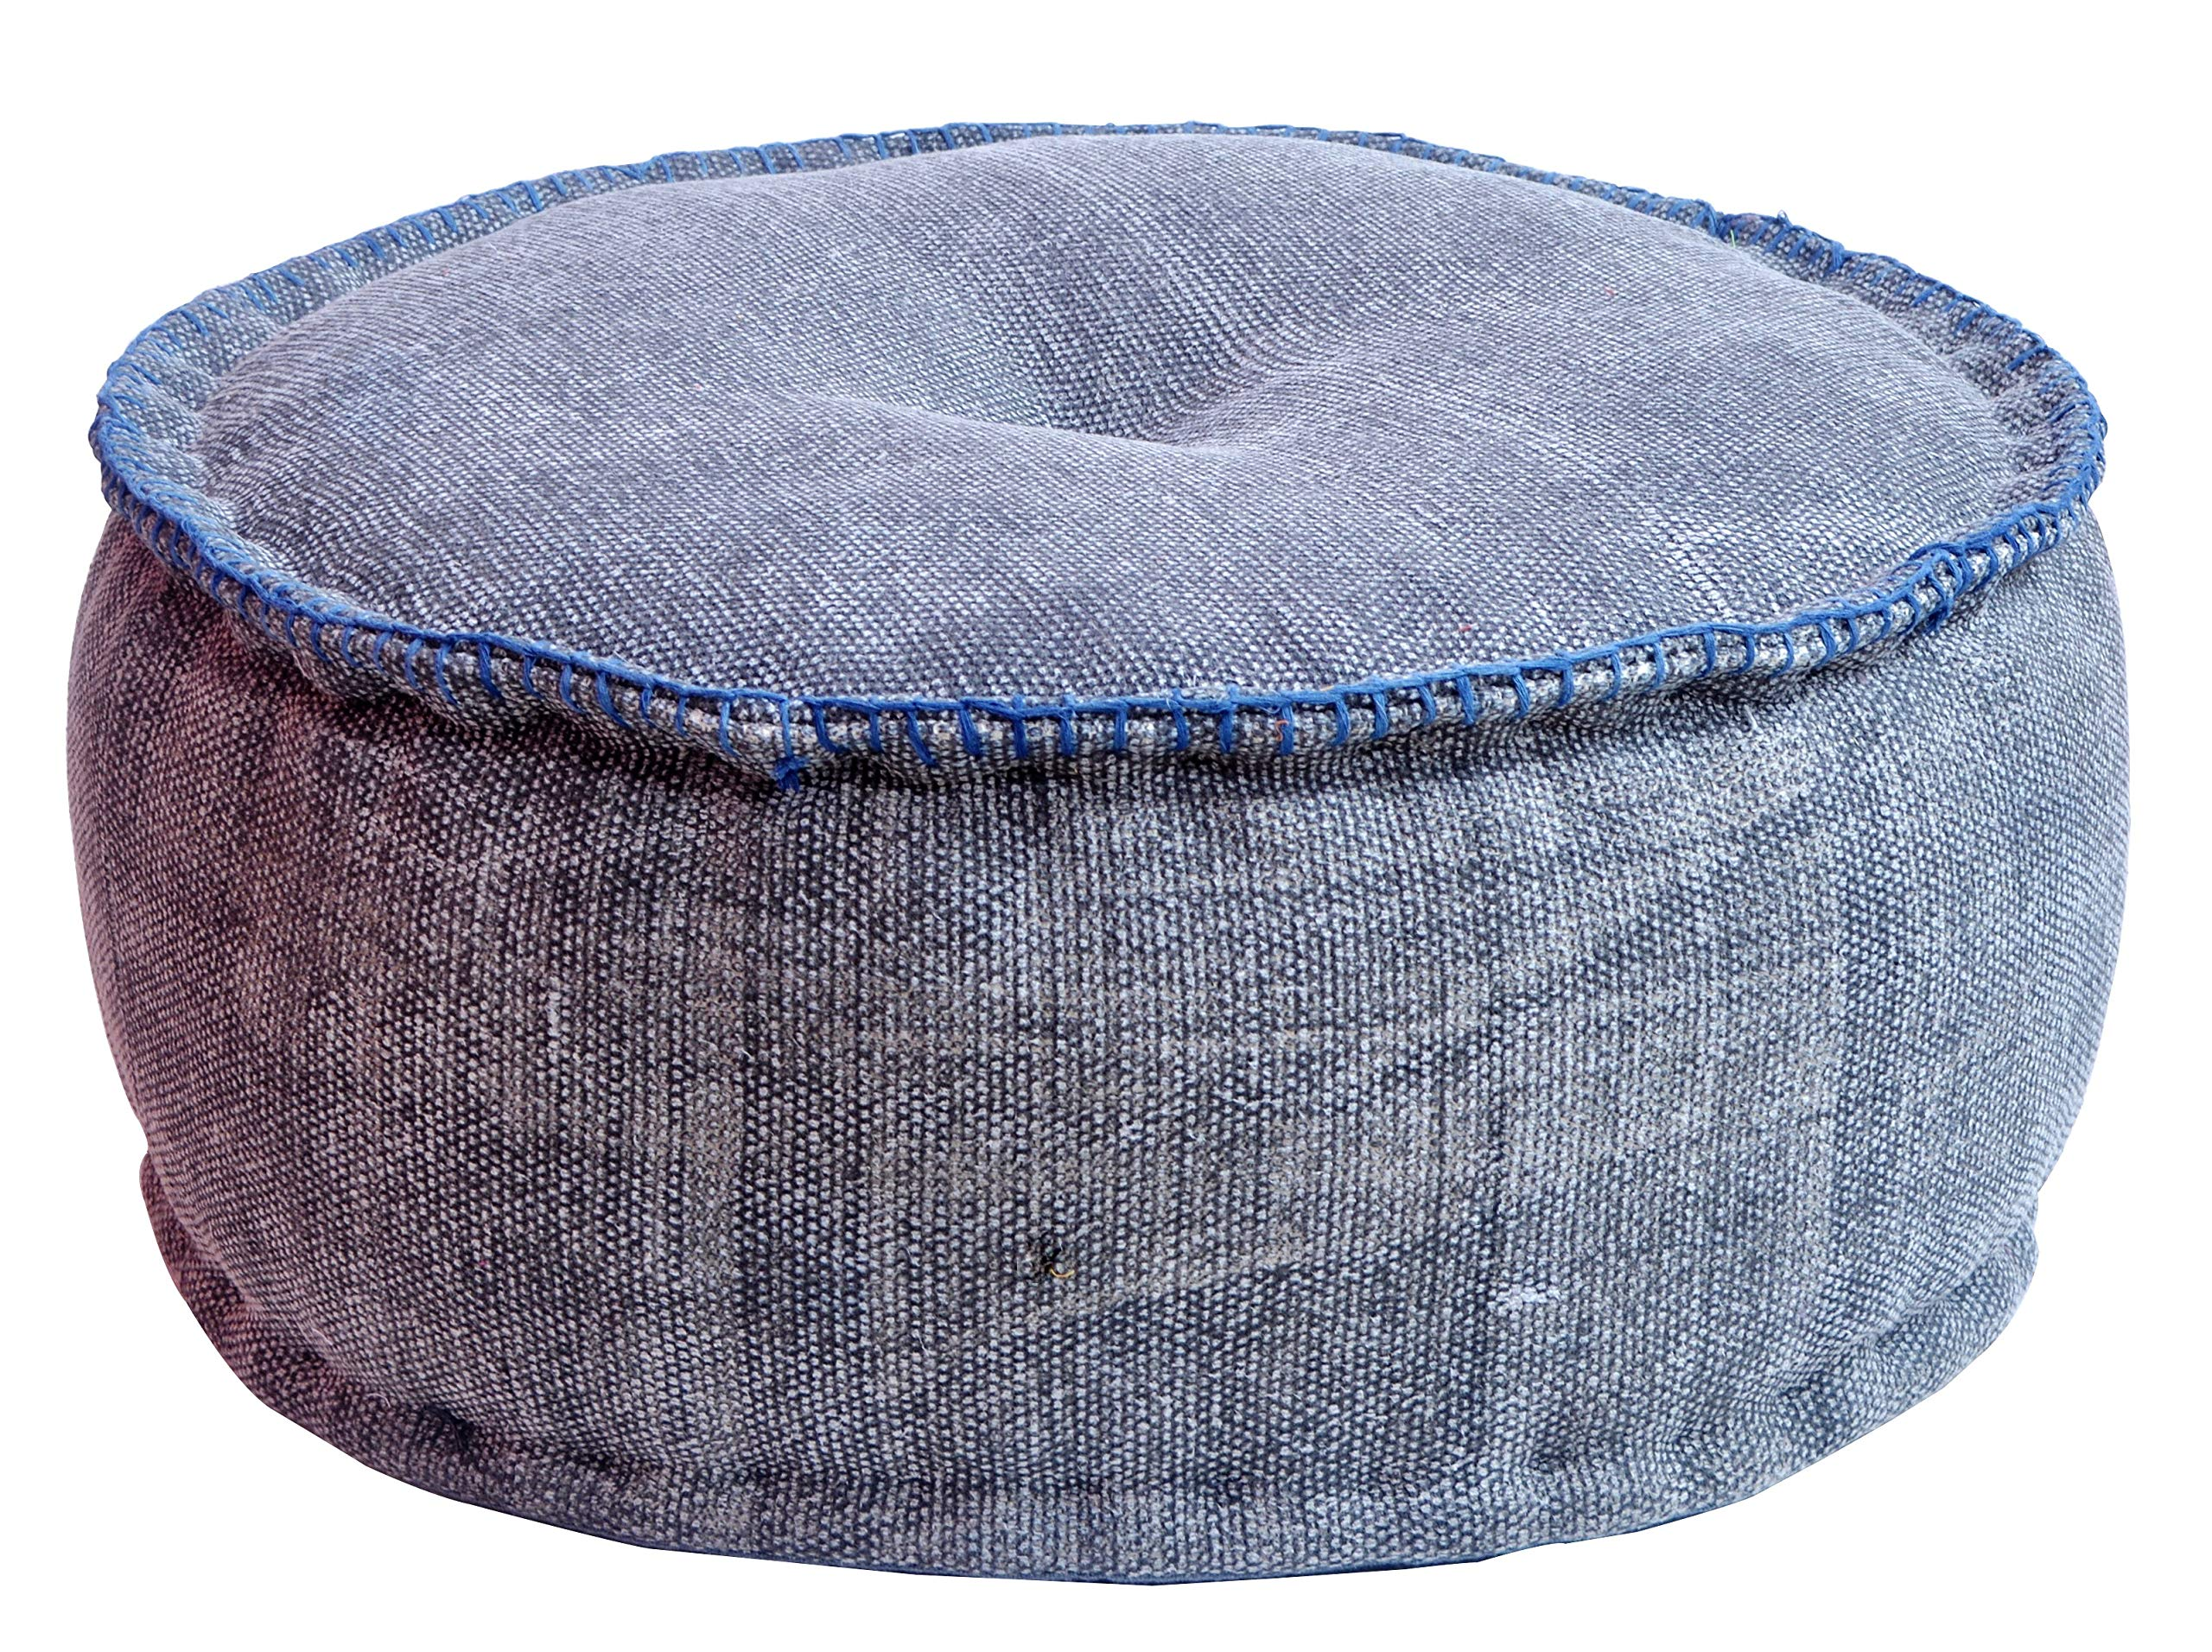 MARUDHARA Kilim Cotton Stuffed Pouf 22''X10'', Round POUFFE, Dhurrie Pouf, Ottoman Extra Sitting, Foot Stool by MARUDHARA